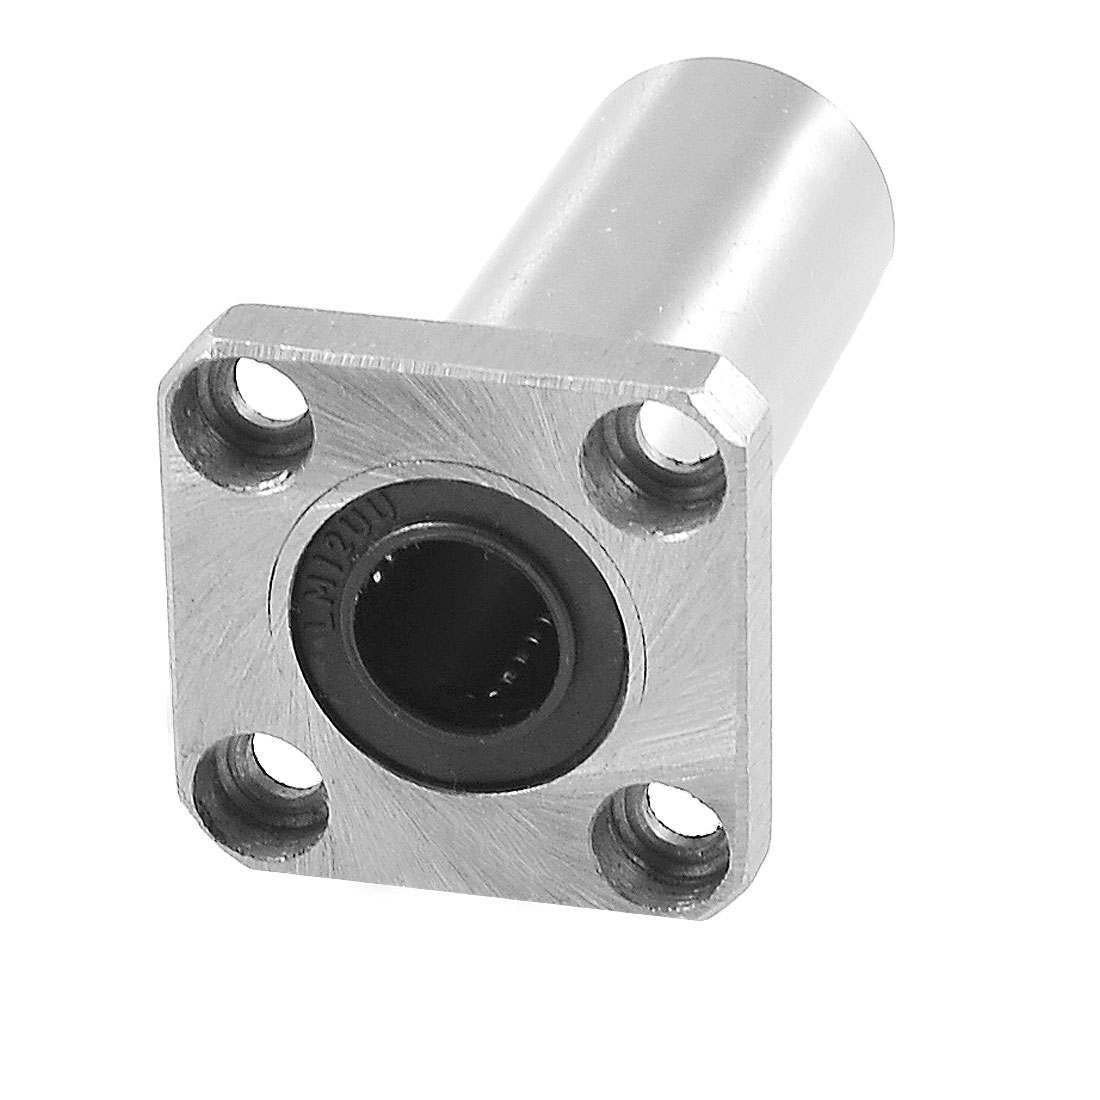 12mm x 21mm x 57mm Square Flange Linear Motion Ball Bearing LMK12UU